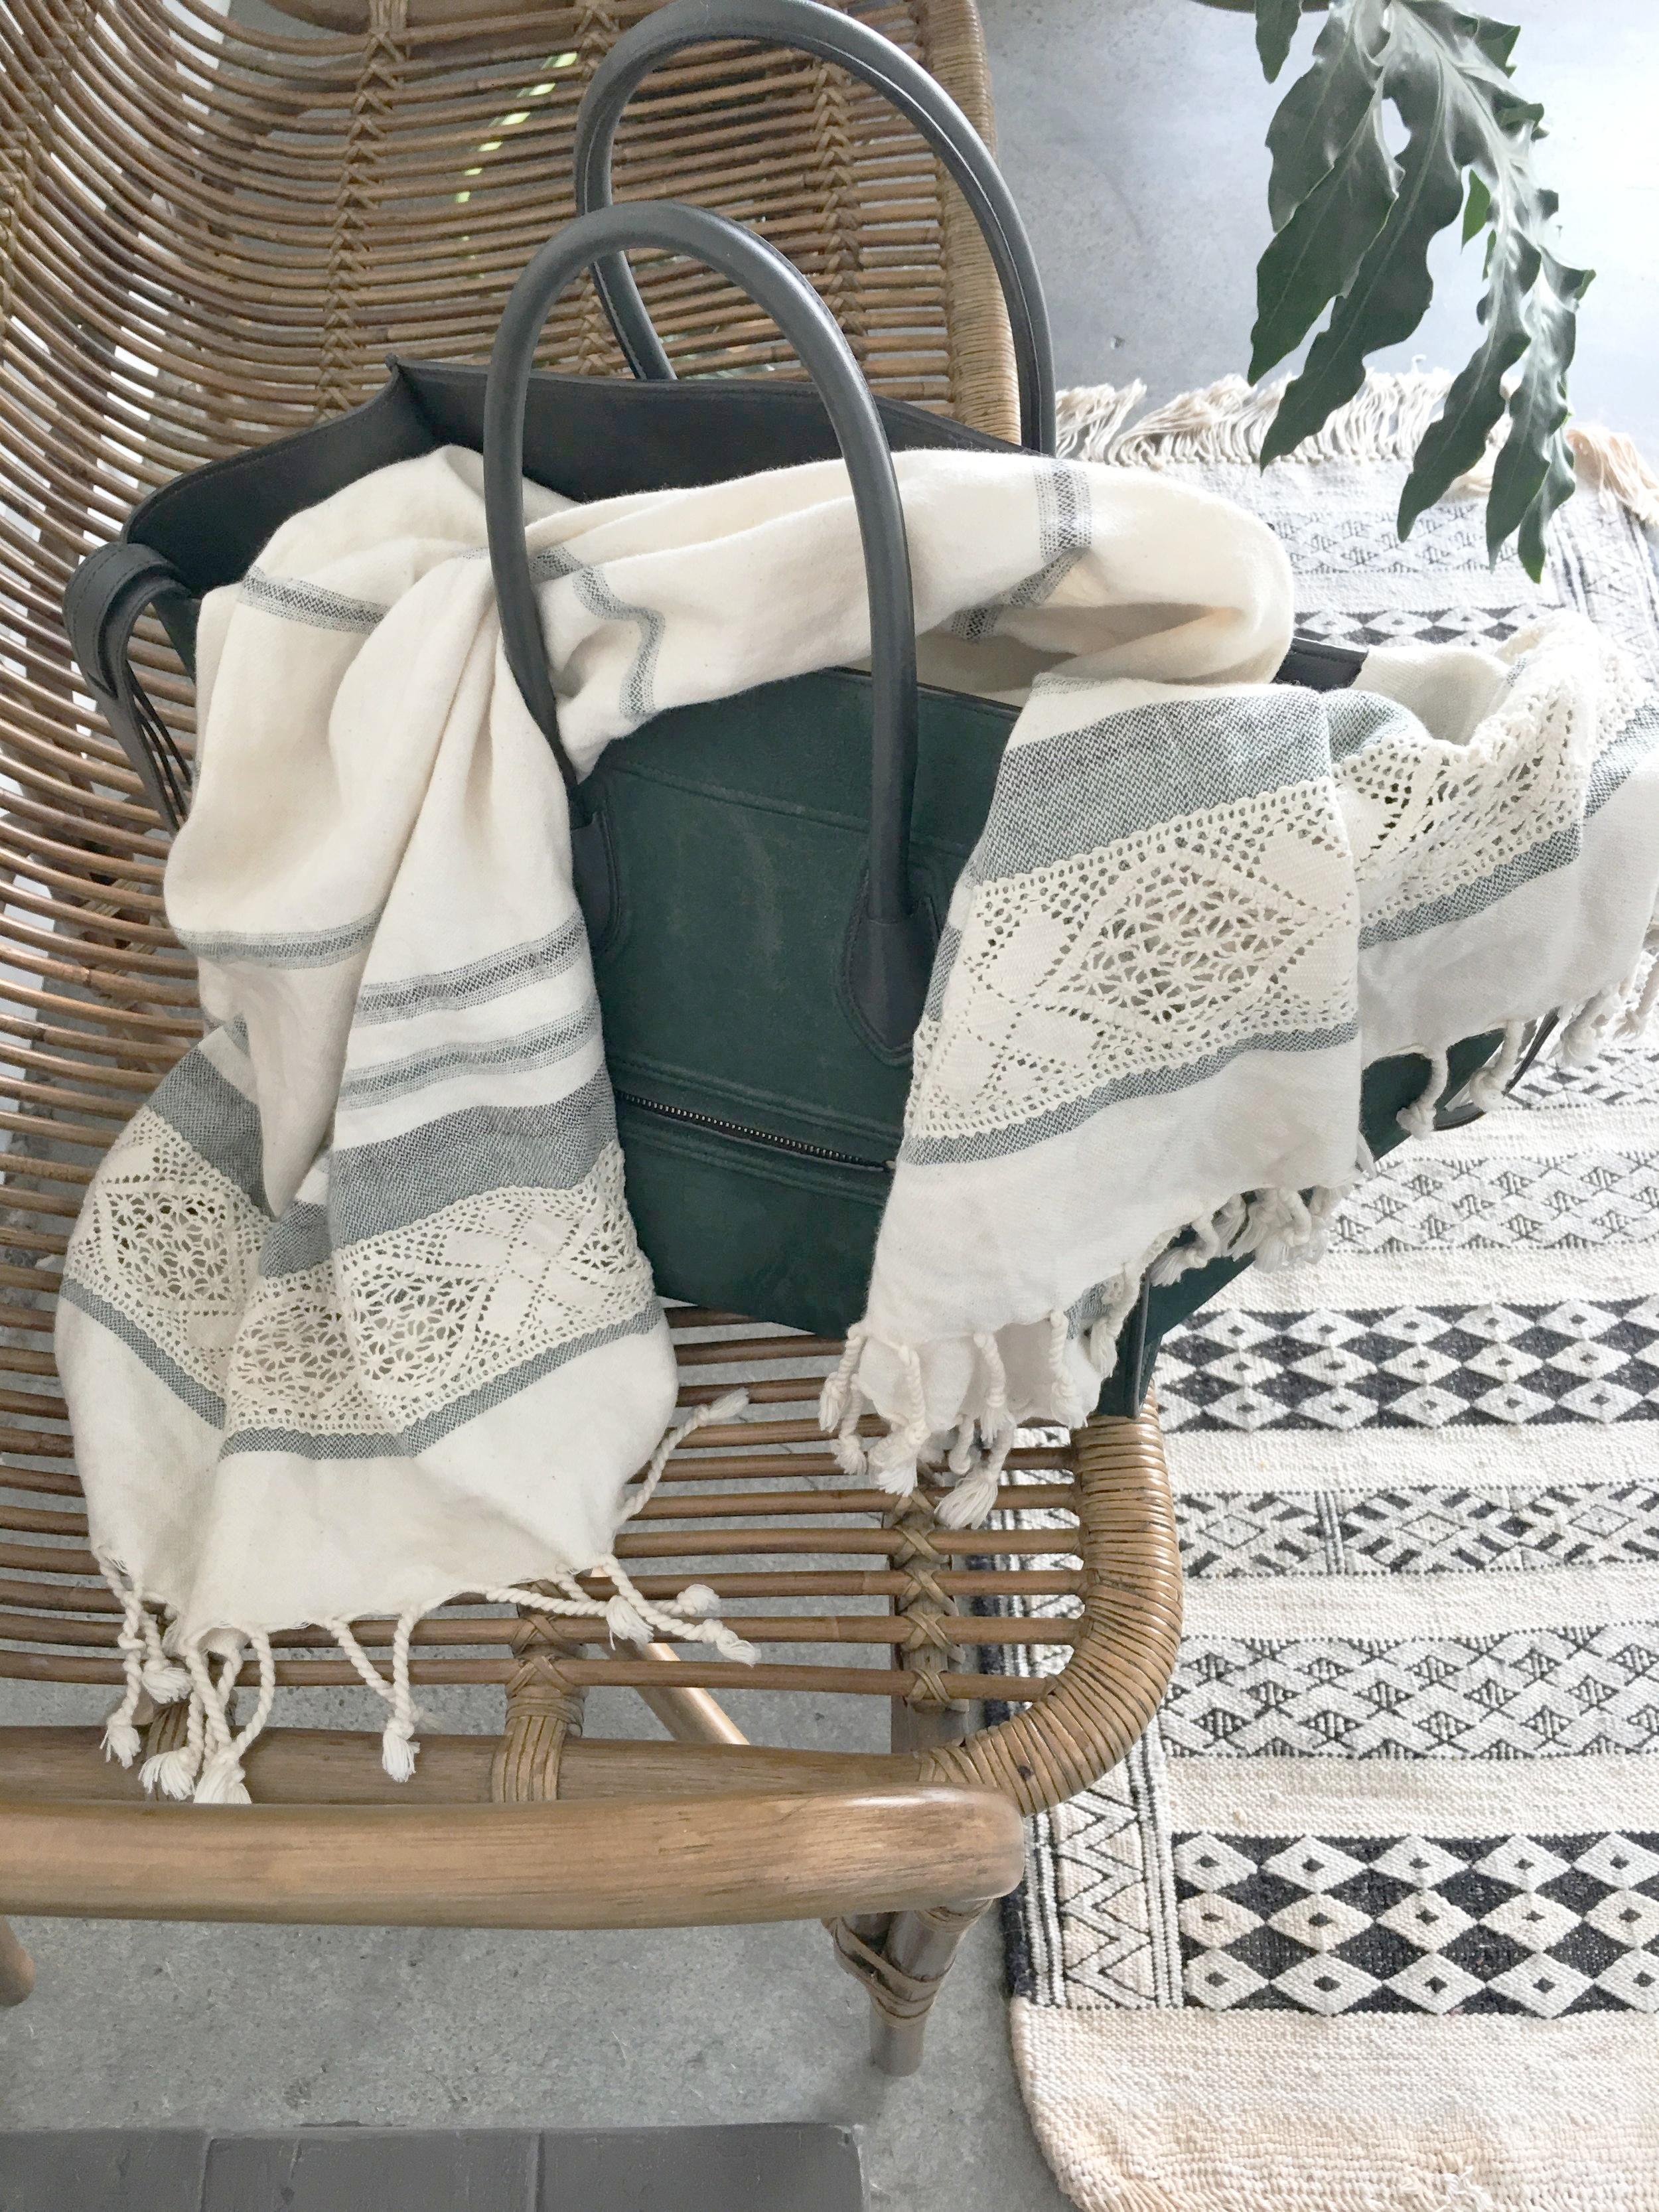 Copy of designer purse luxury towel